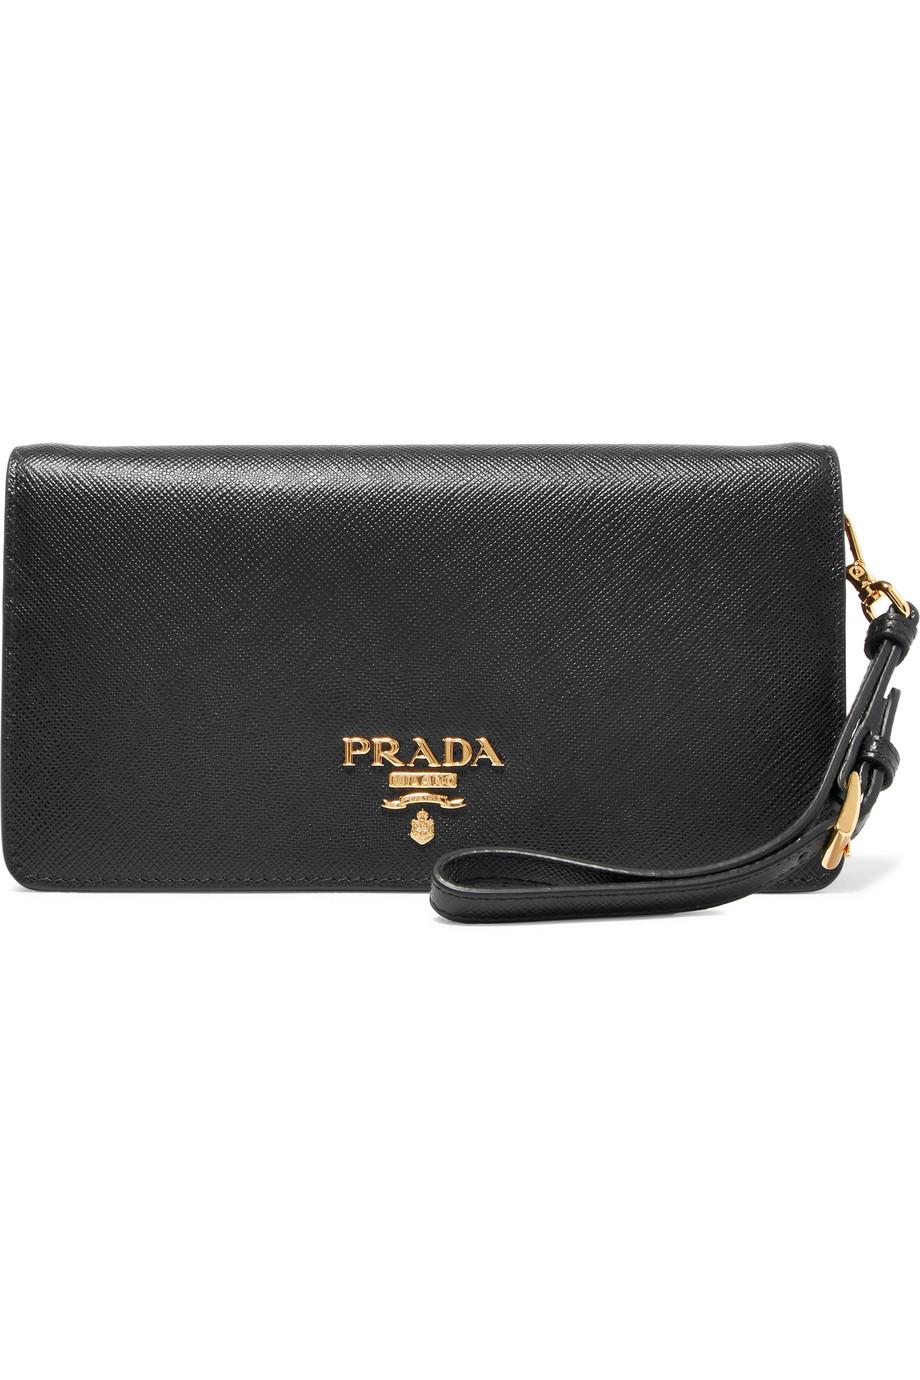 02779ab73e47 ... buy prada black textured leather shoulder bag lyst. view fullscreen  a1f46 883e0